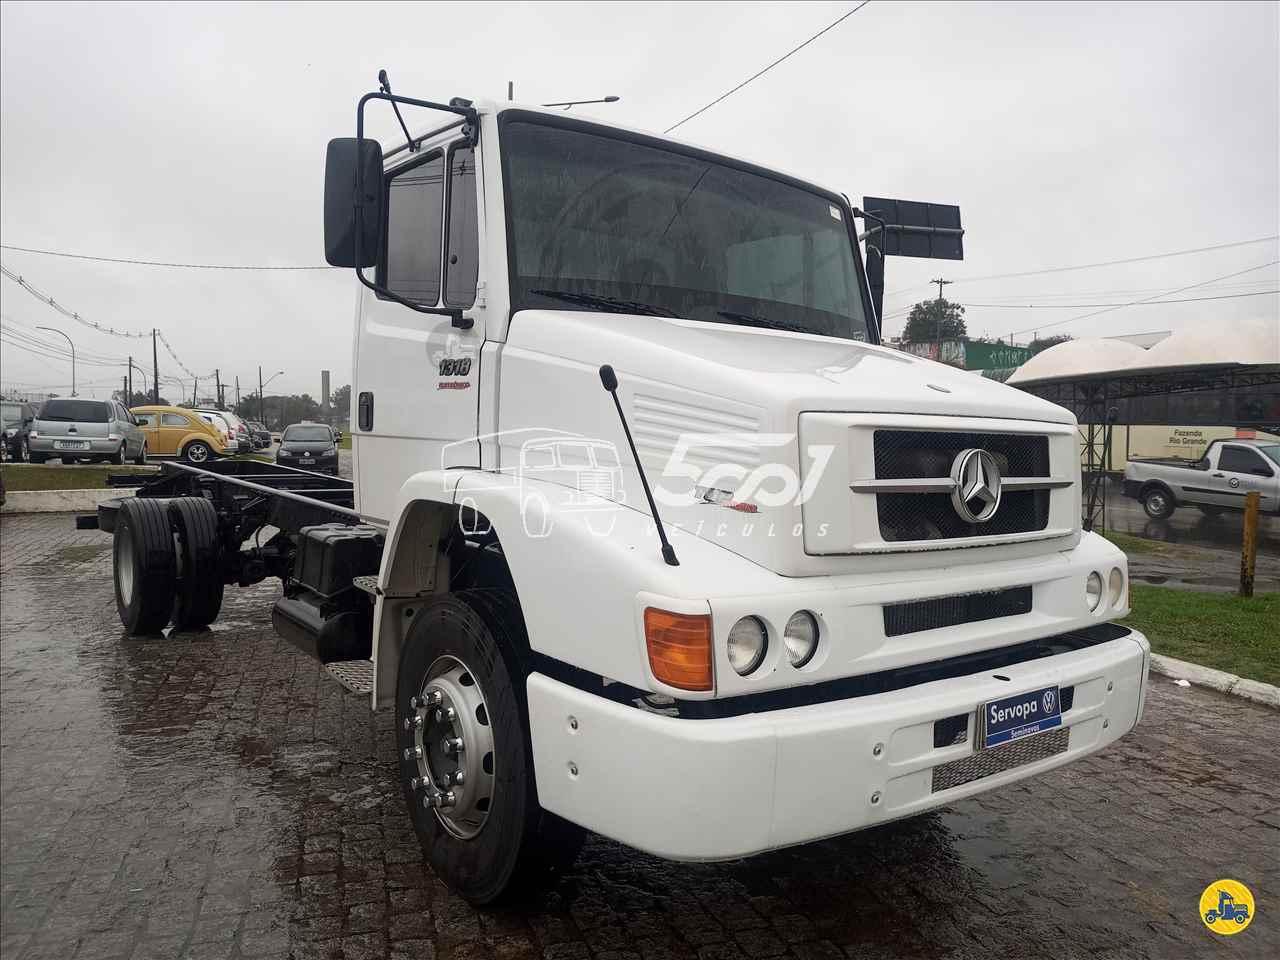 CAMINHAO MERCEDES-BENZ MB 1318 Carroceria Cabine Suplementar Toco 4x2 5001 Veículos - Curitiba CURITIBA PARANÁ PR